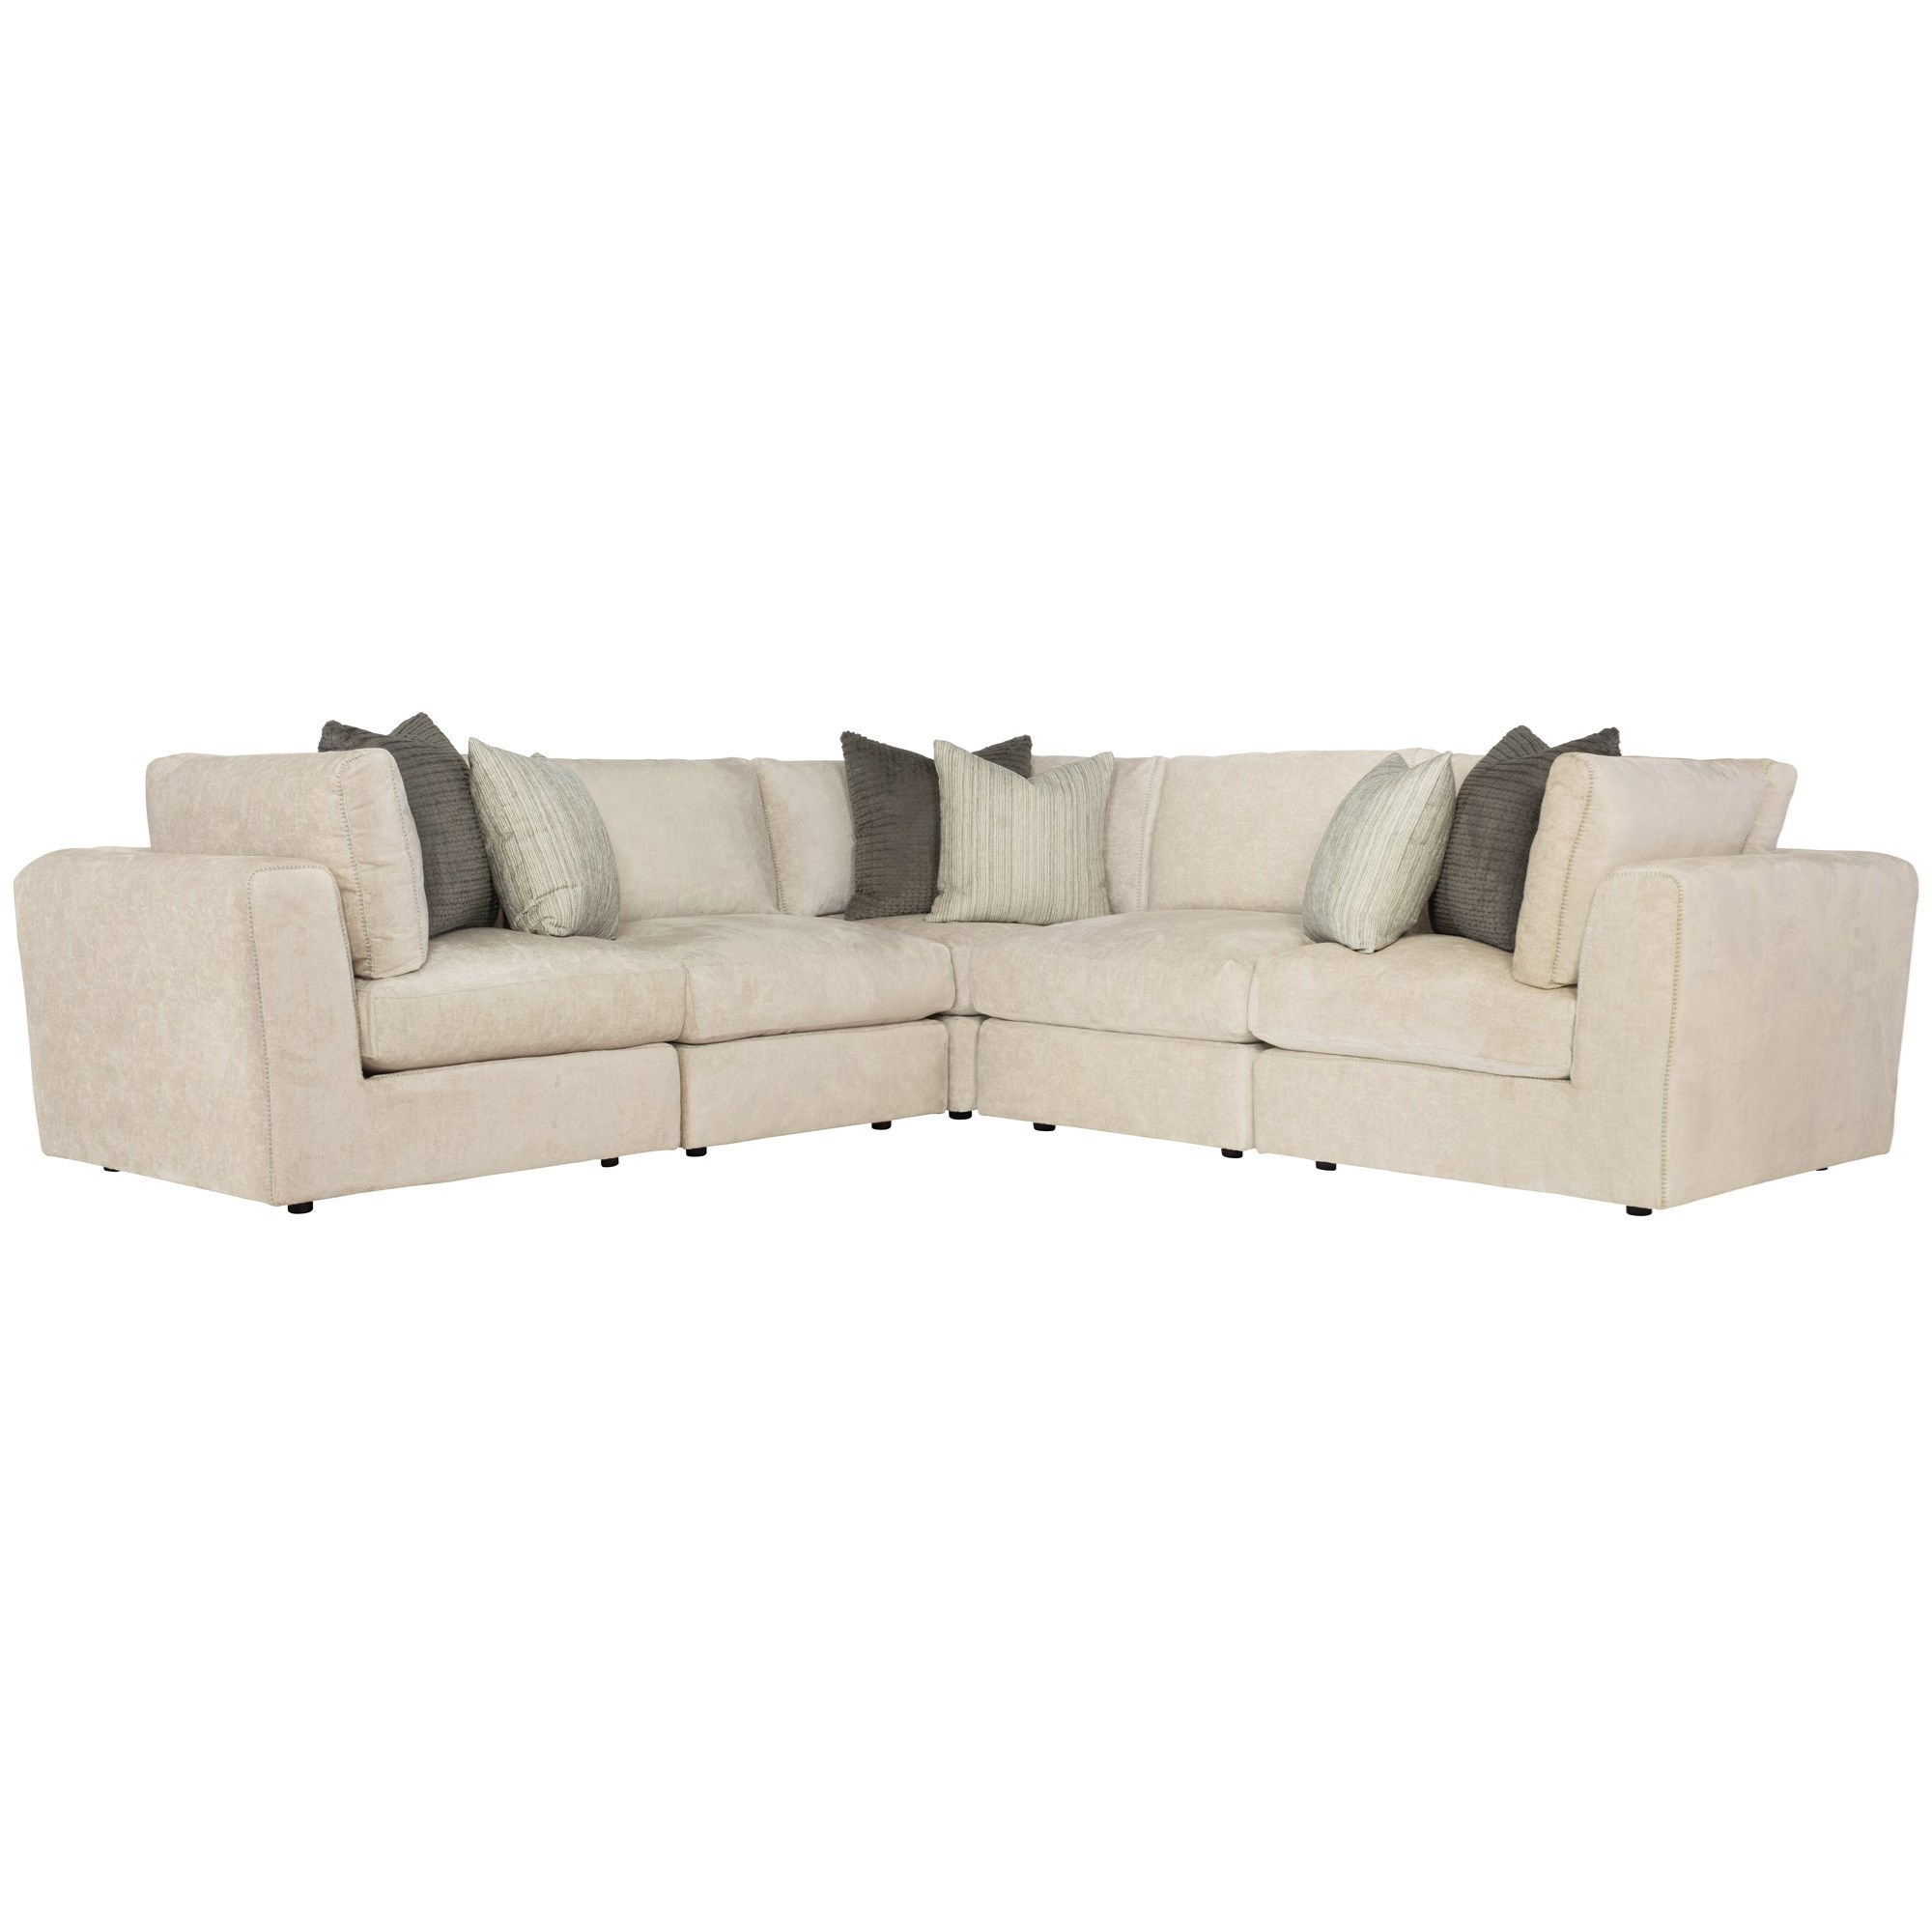 Oasis Sectional by Bernhardt at Jacksonville Furniture Mart